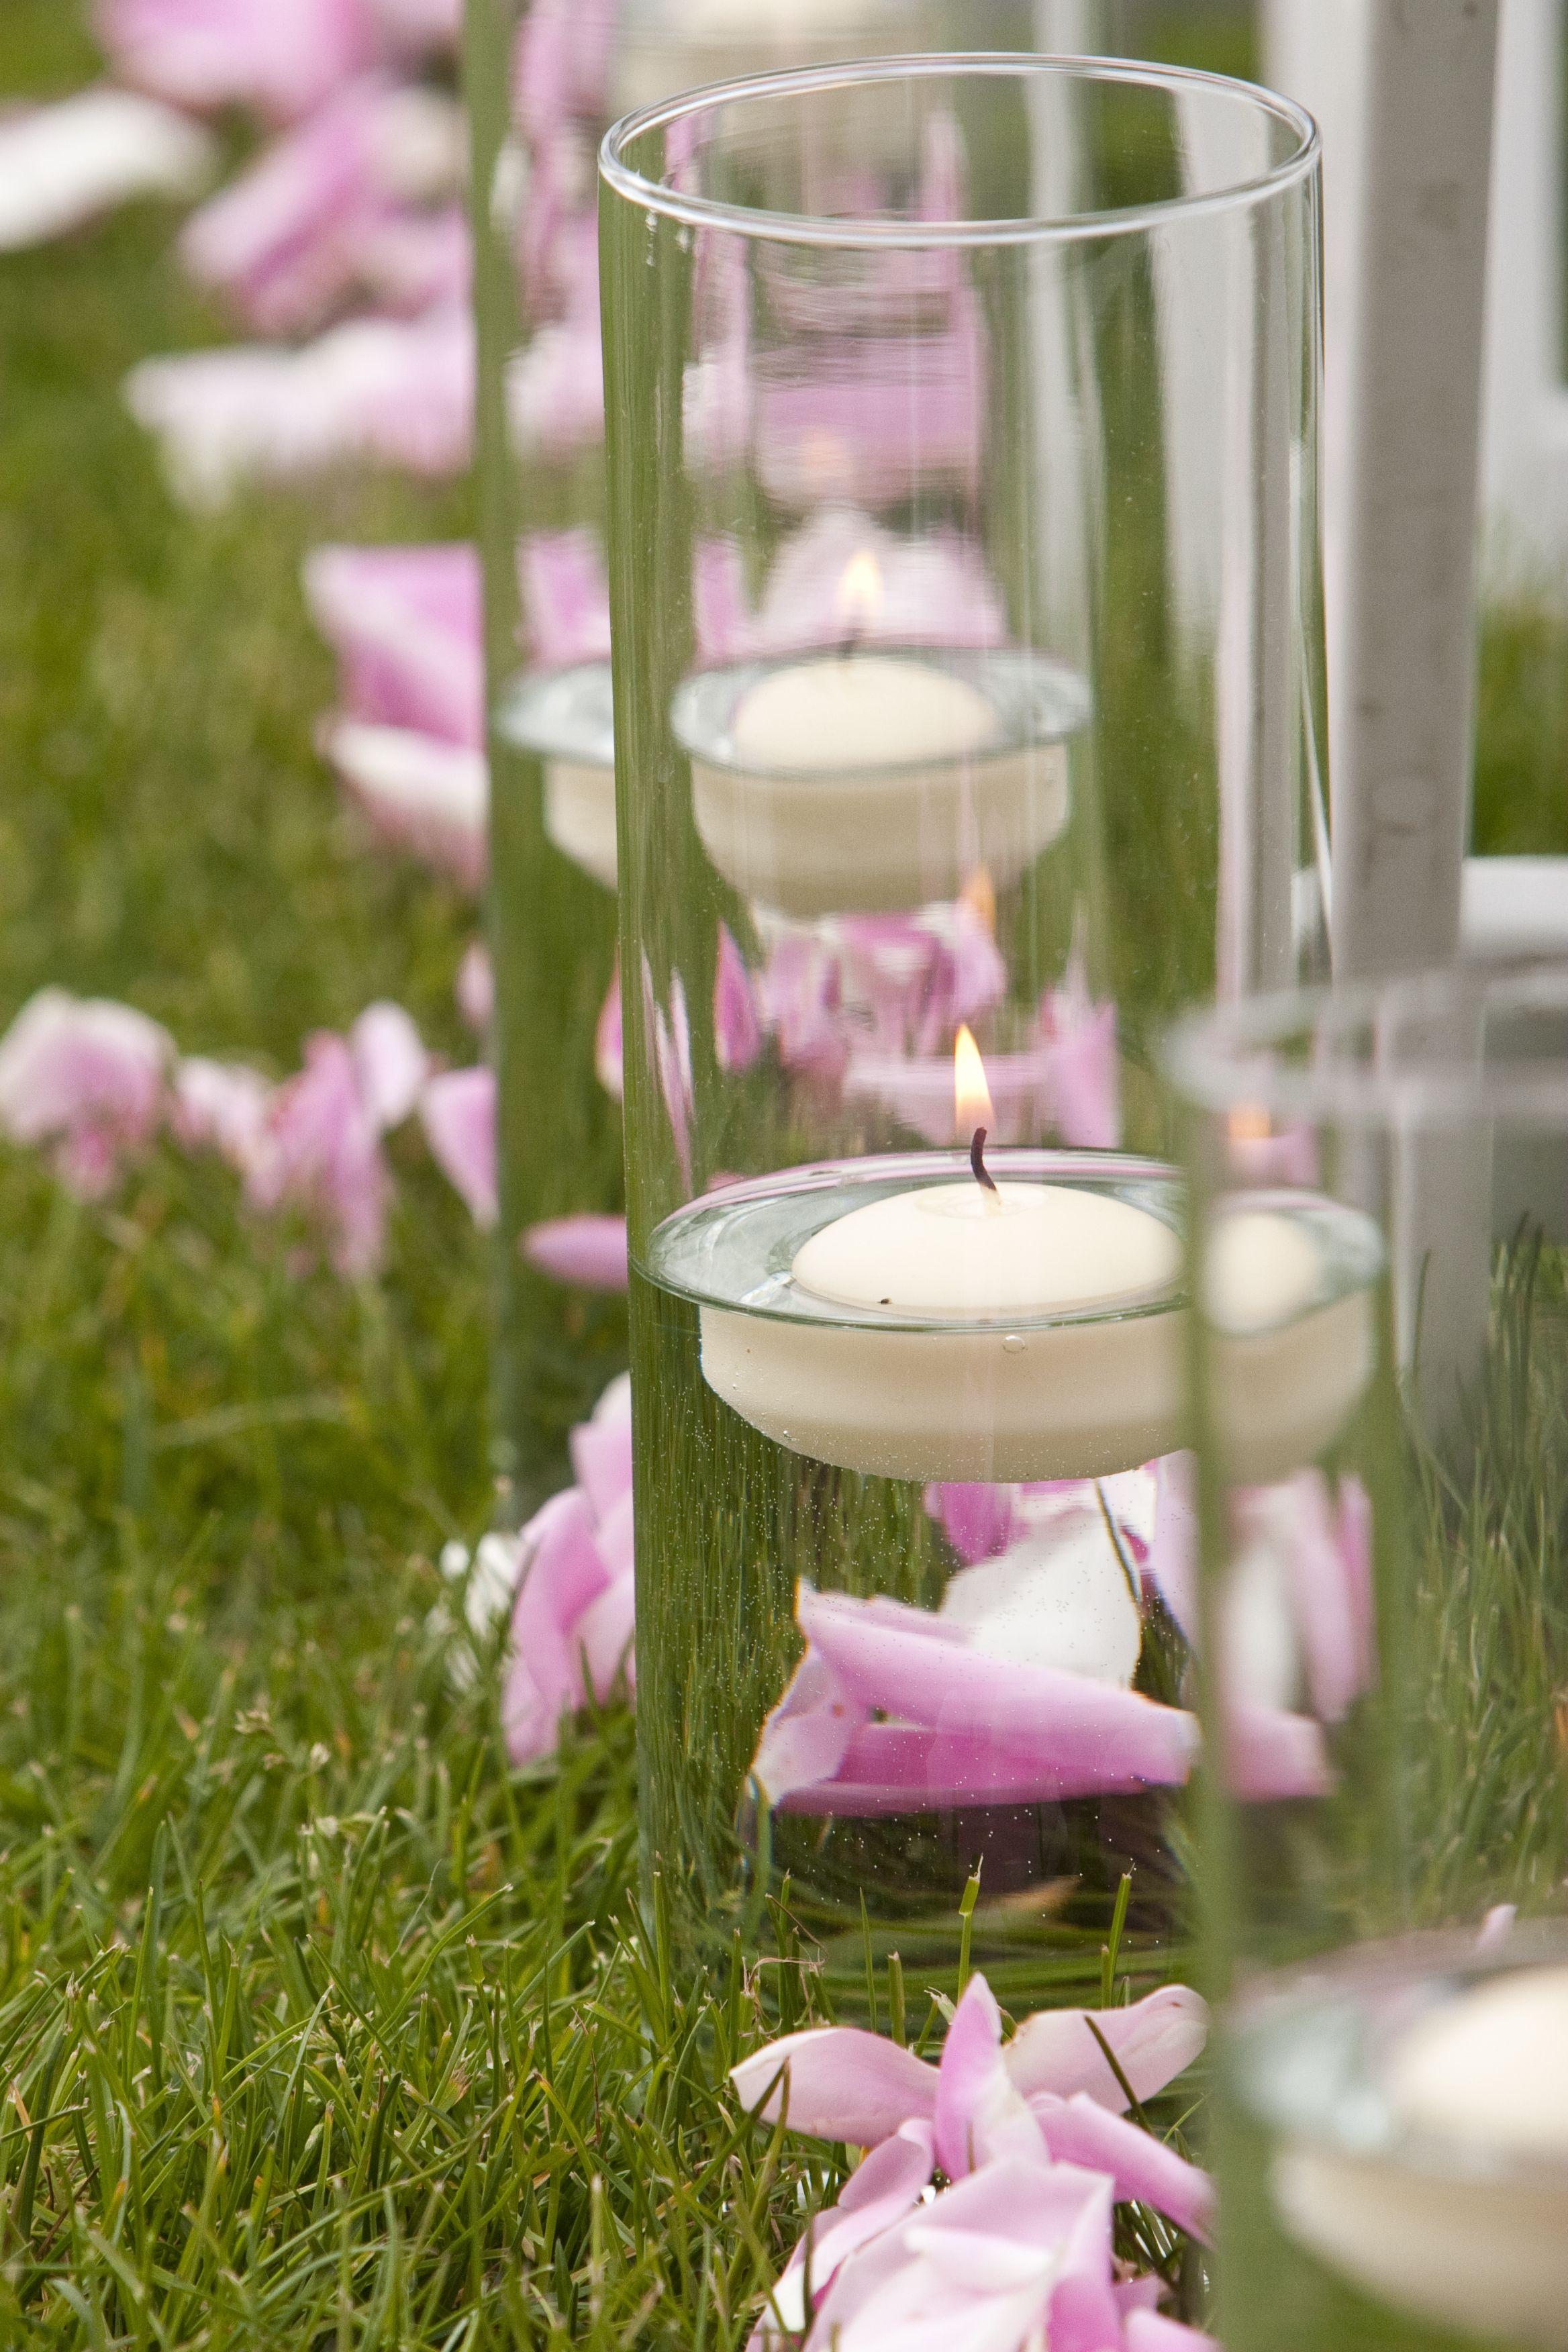 Flowers from Ross & Heather's wedding at Alderbrook Resort. Tasha Owen Photography.